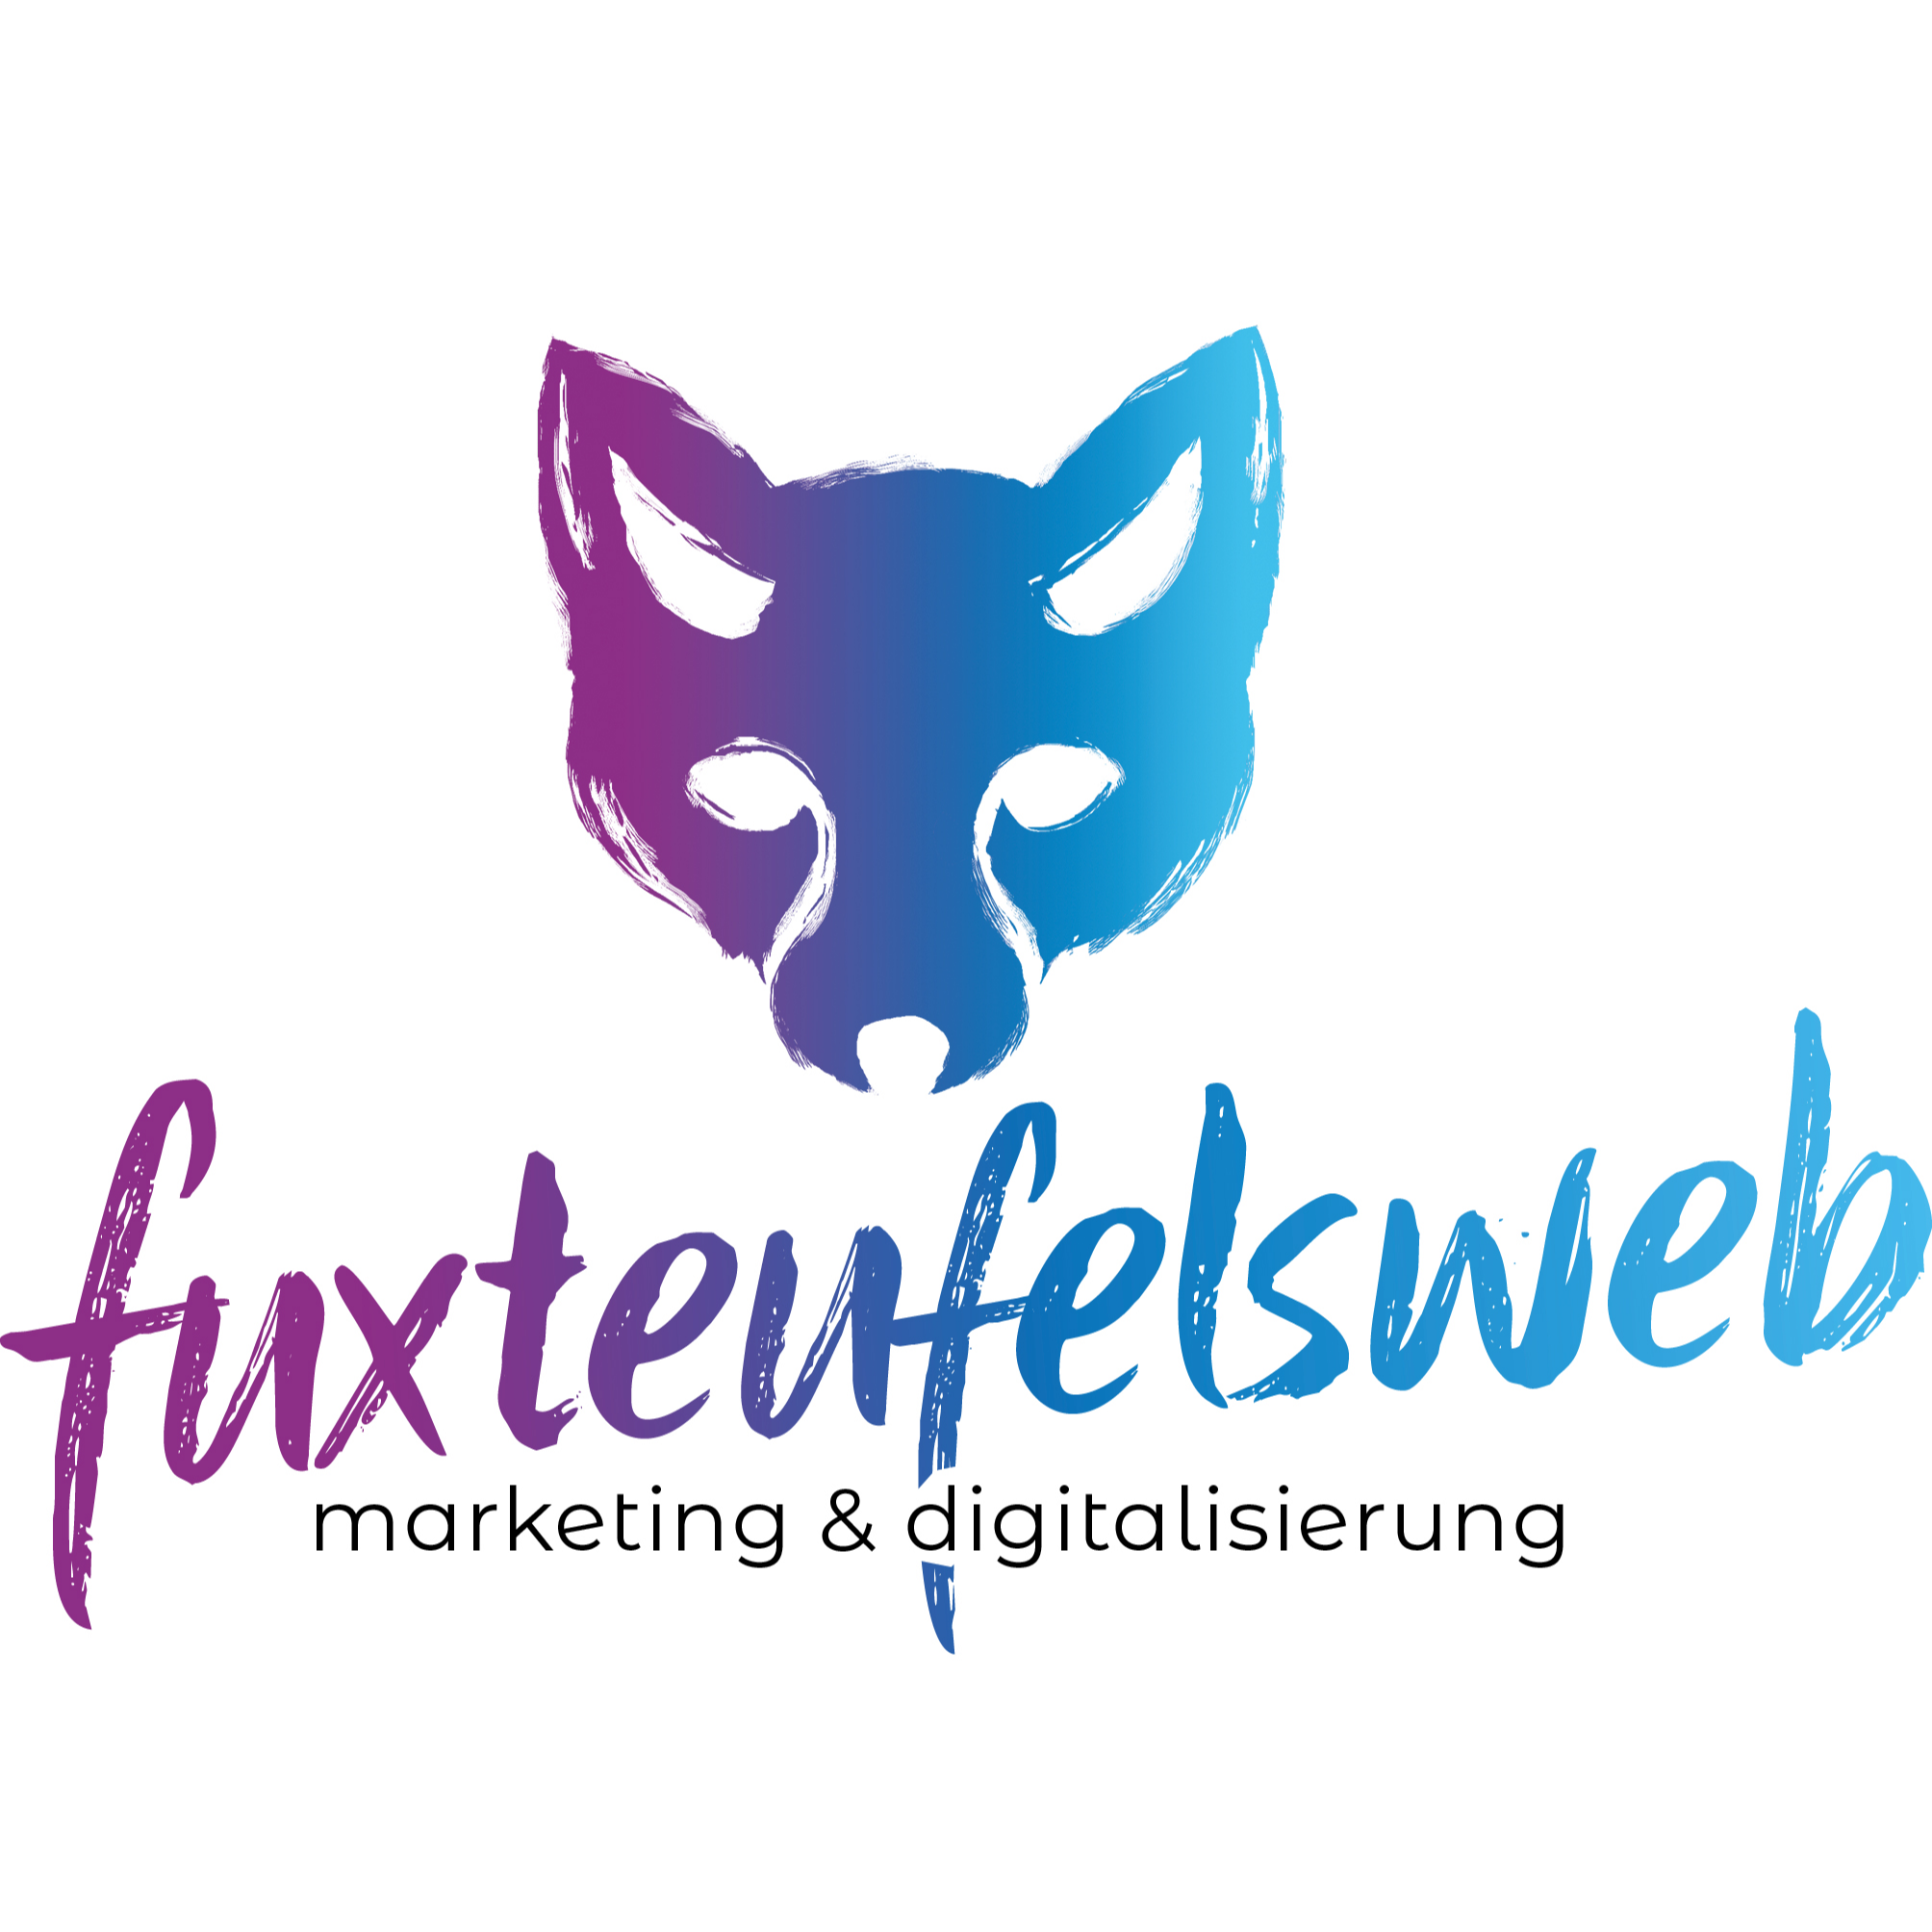 Bild zu fuxteufelsweb – marketing & digitalisierung in Ulm an der Donau